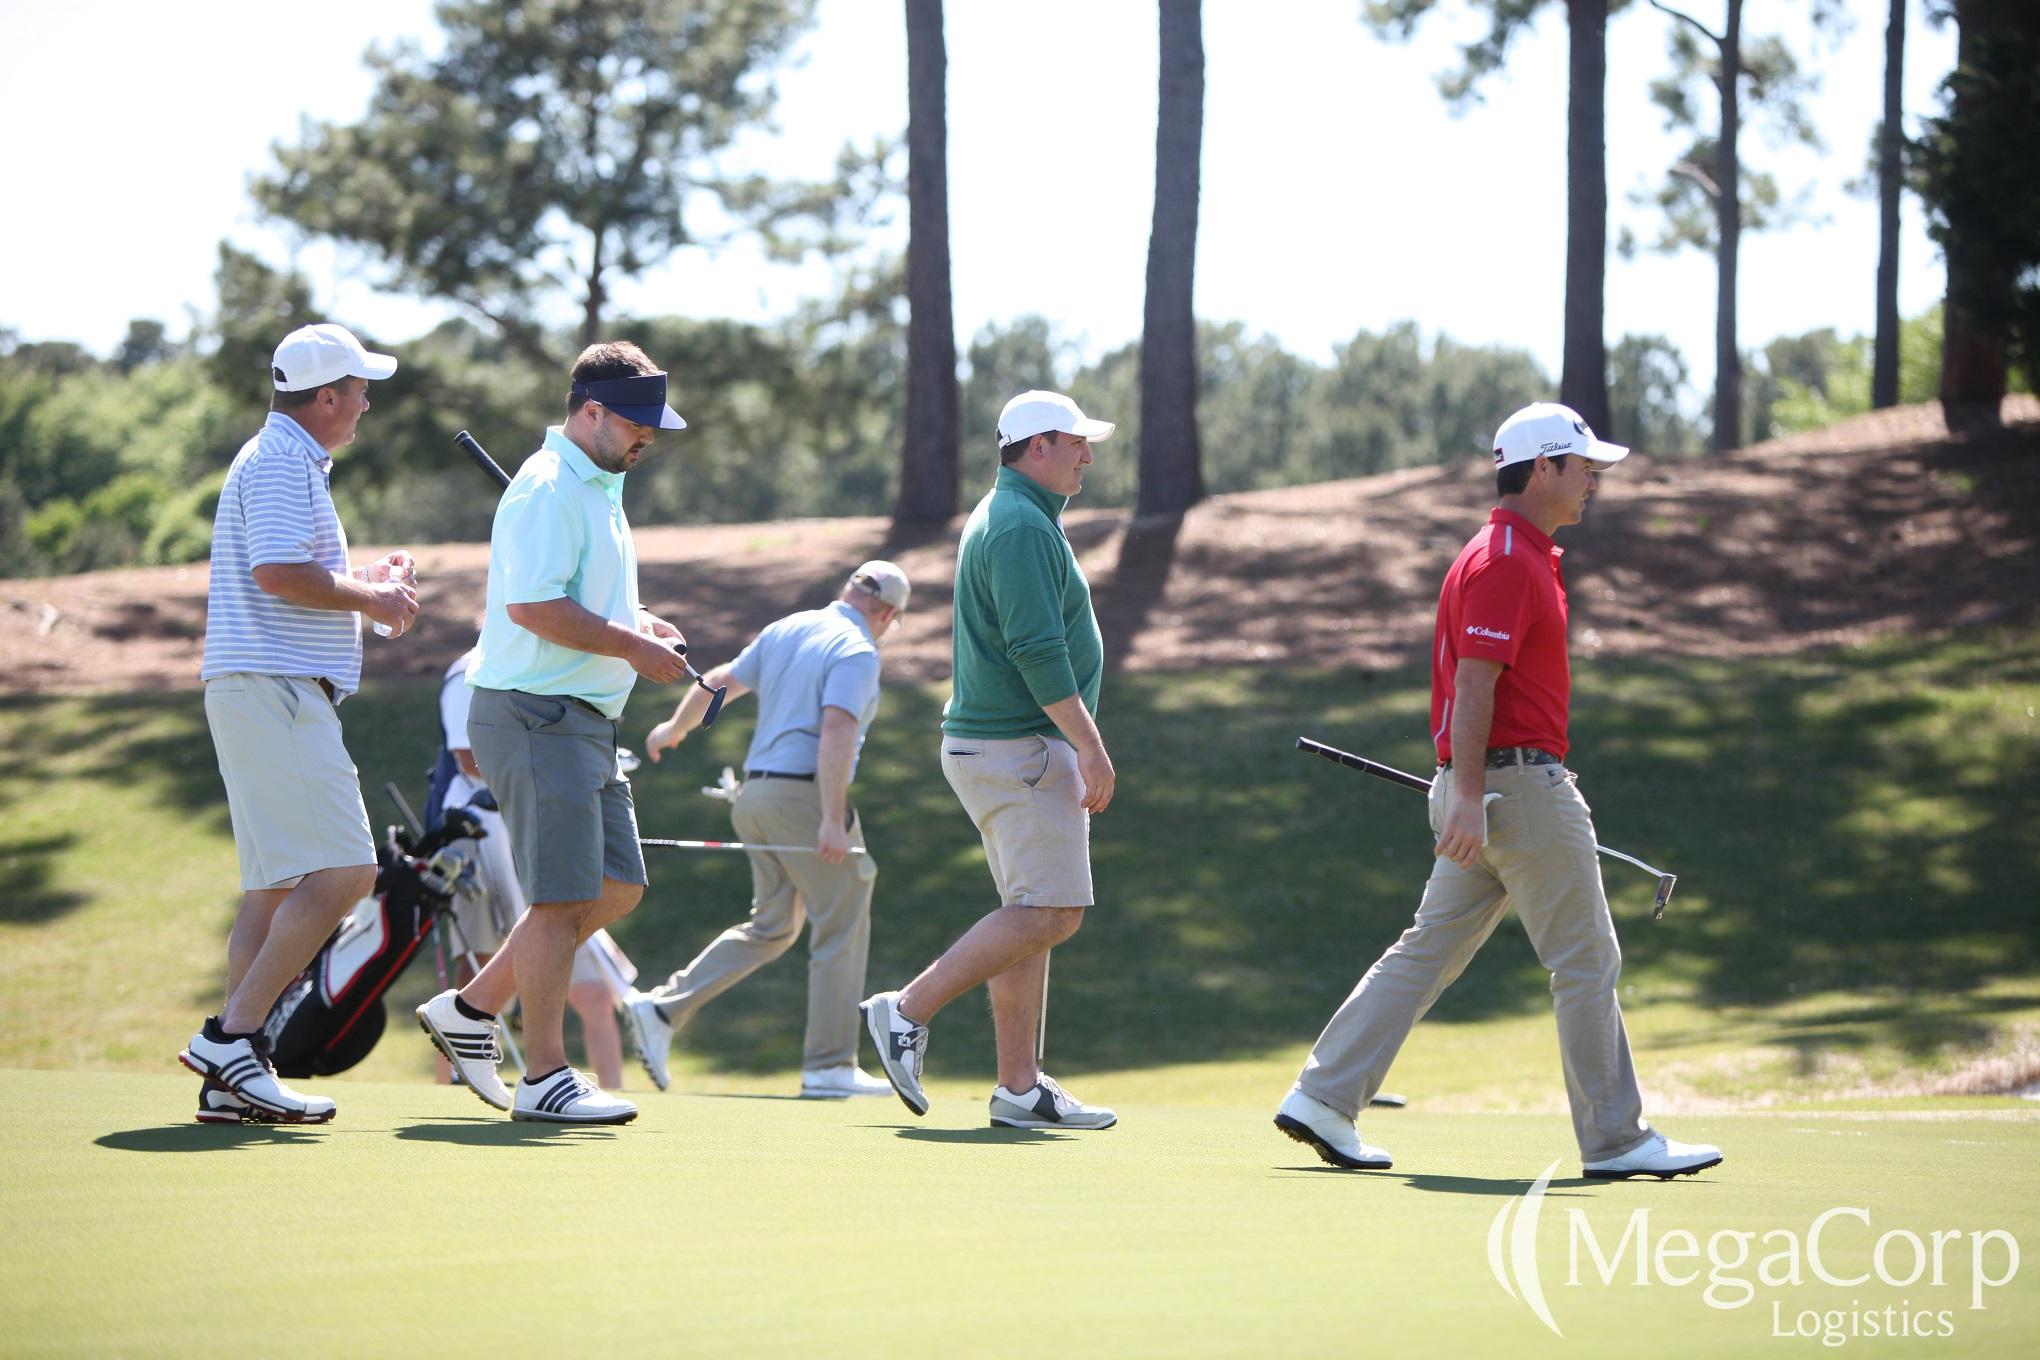 Five men walking across a golf course, clubs in hand.